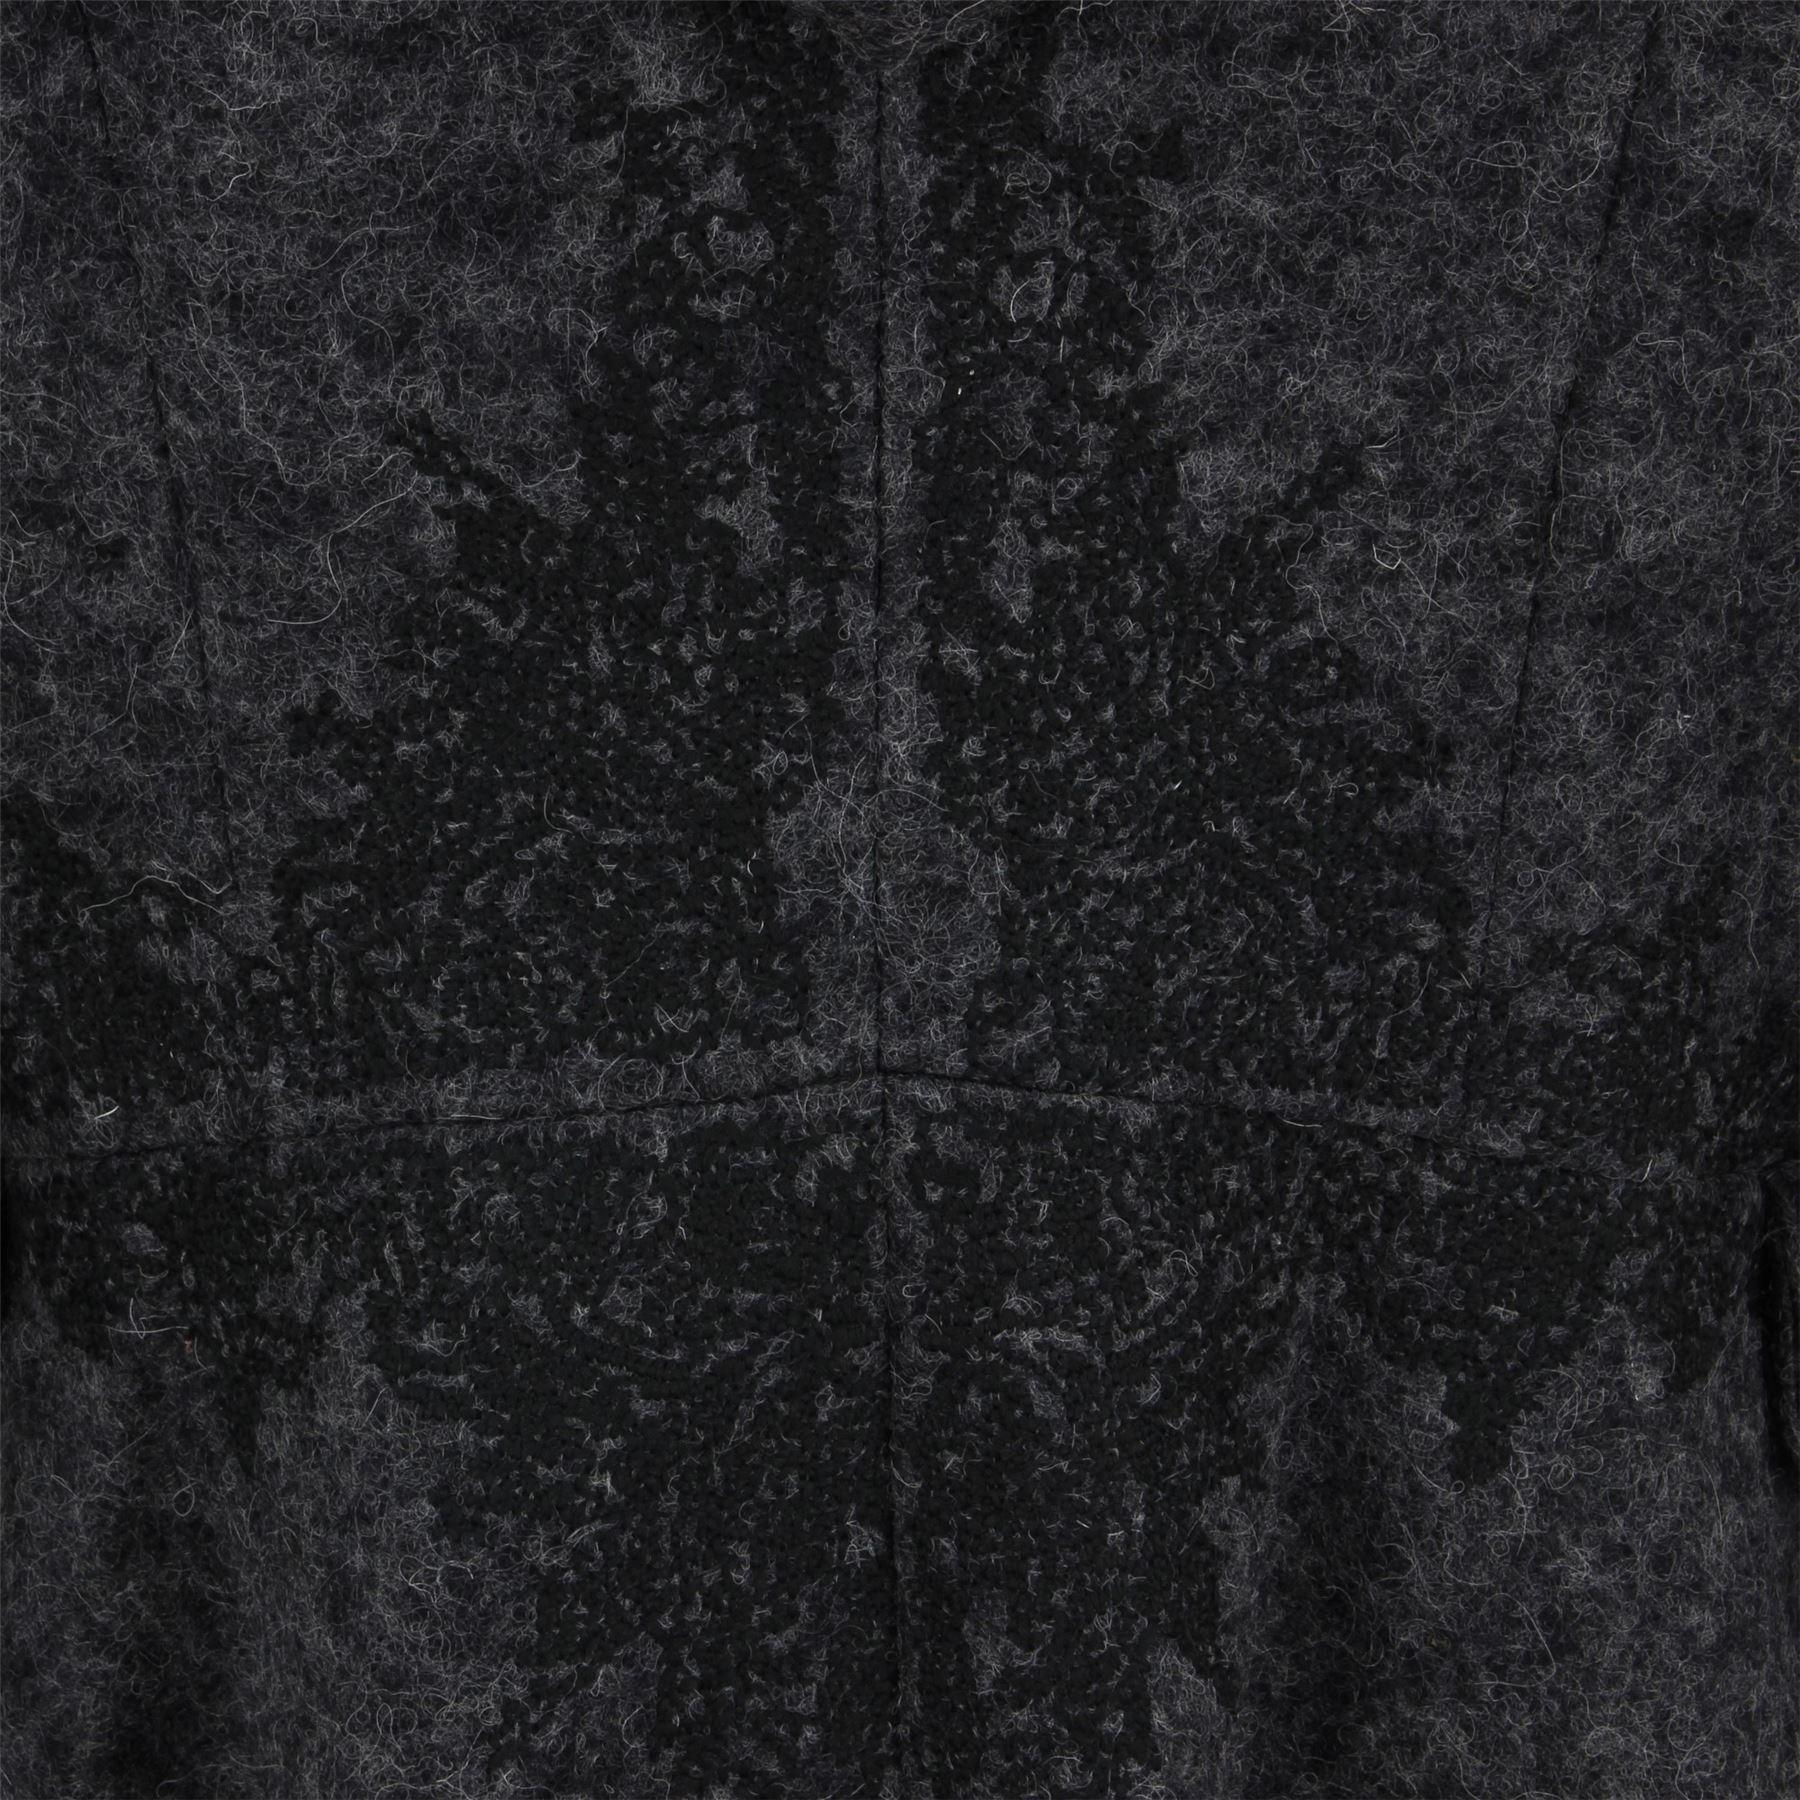 Ladies-Wool-Winter-Coat-Jacket-BOHEMIA-SWEDEN-Woven-Wool-rich-blend-Hood thumbnail 5